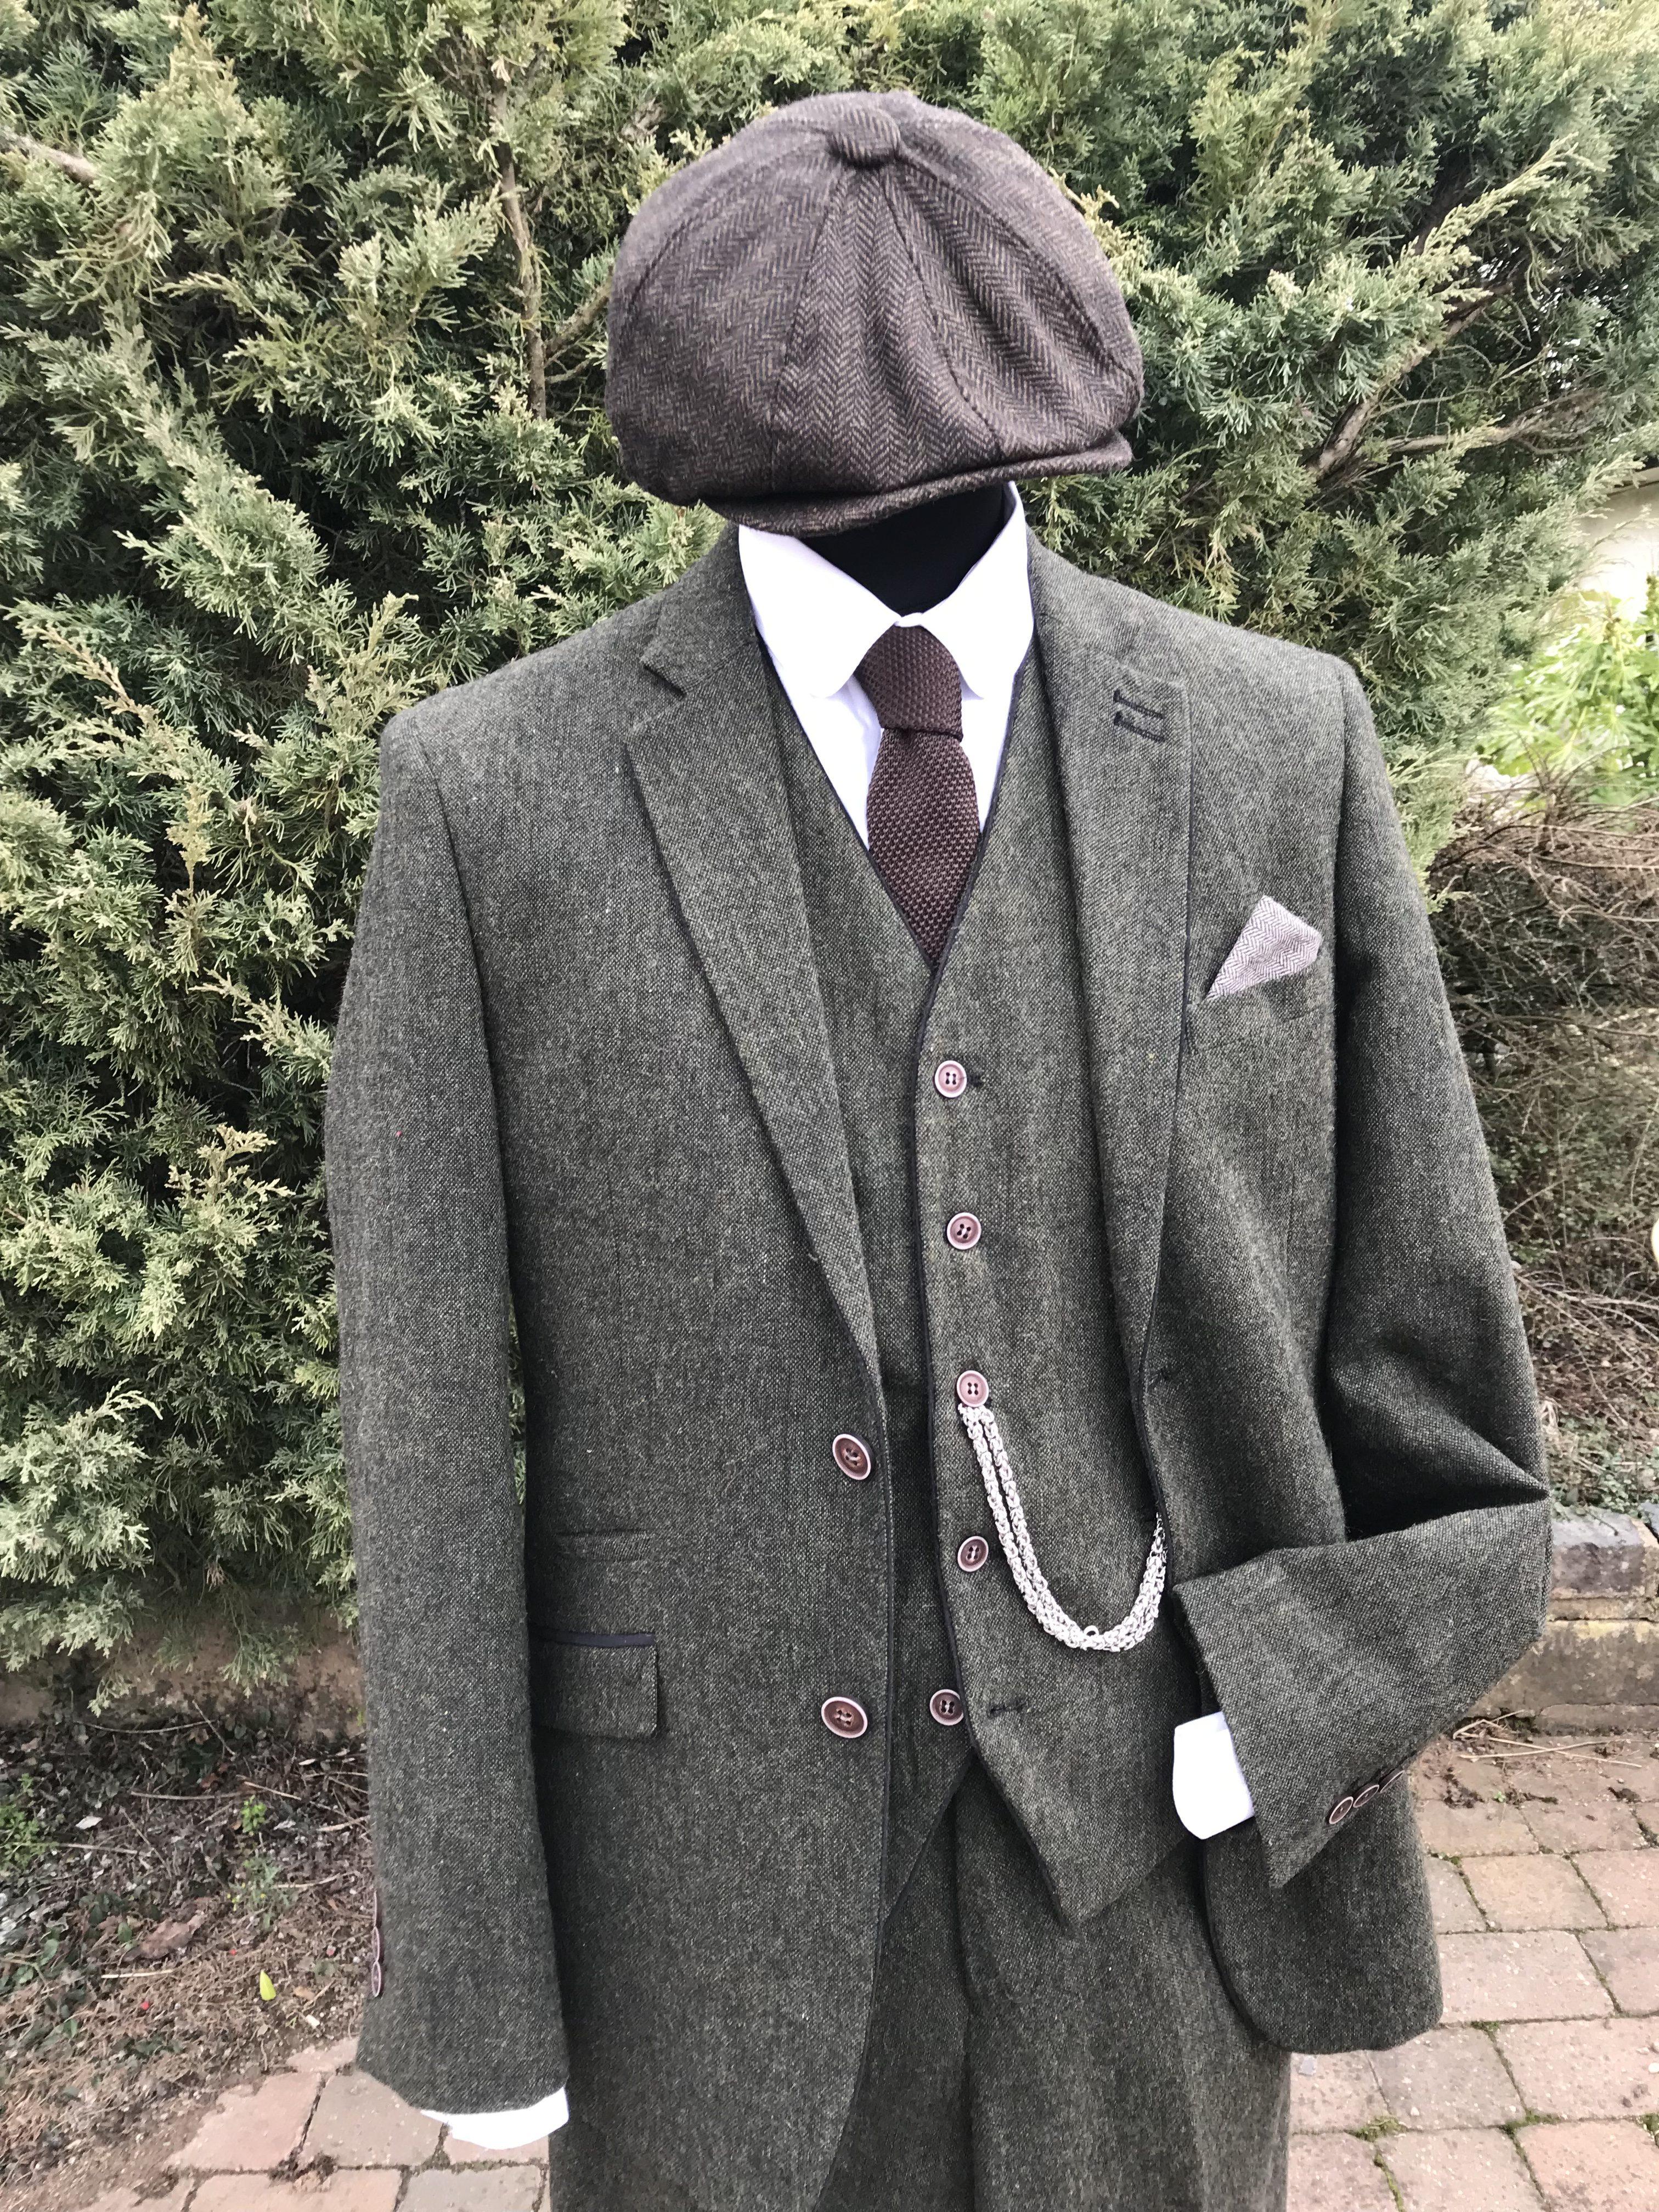 Masquerade Green Tweed Peaky Blinders Suit Masquerade